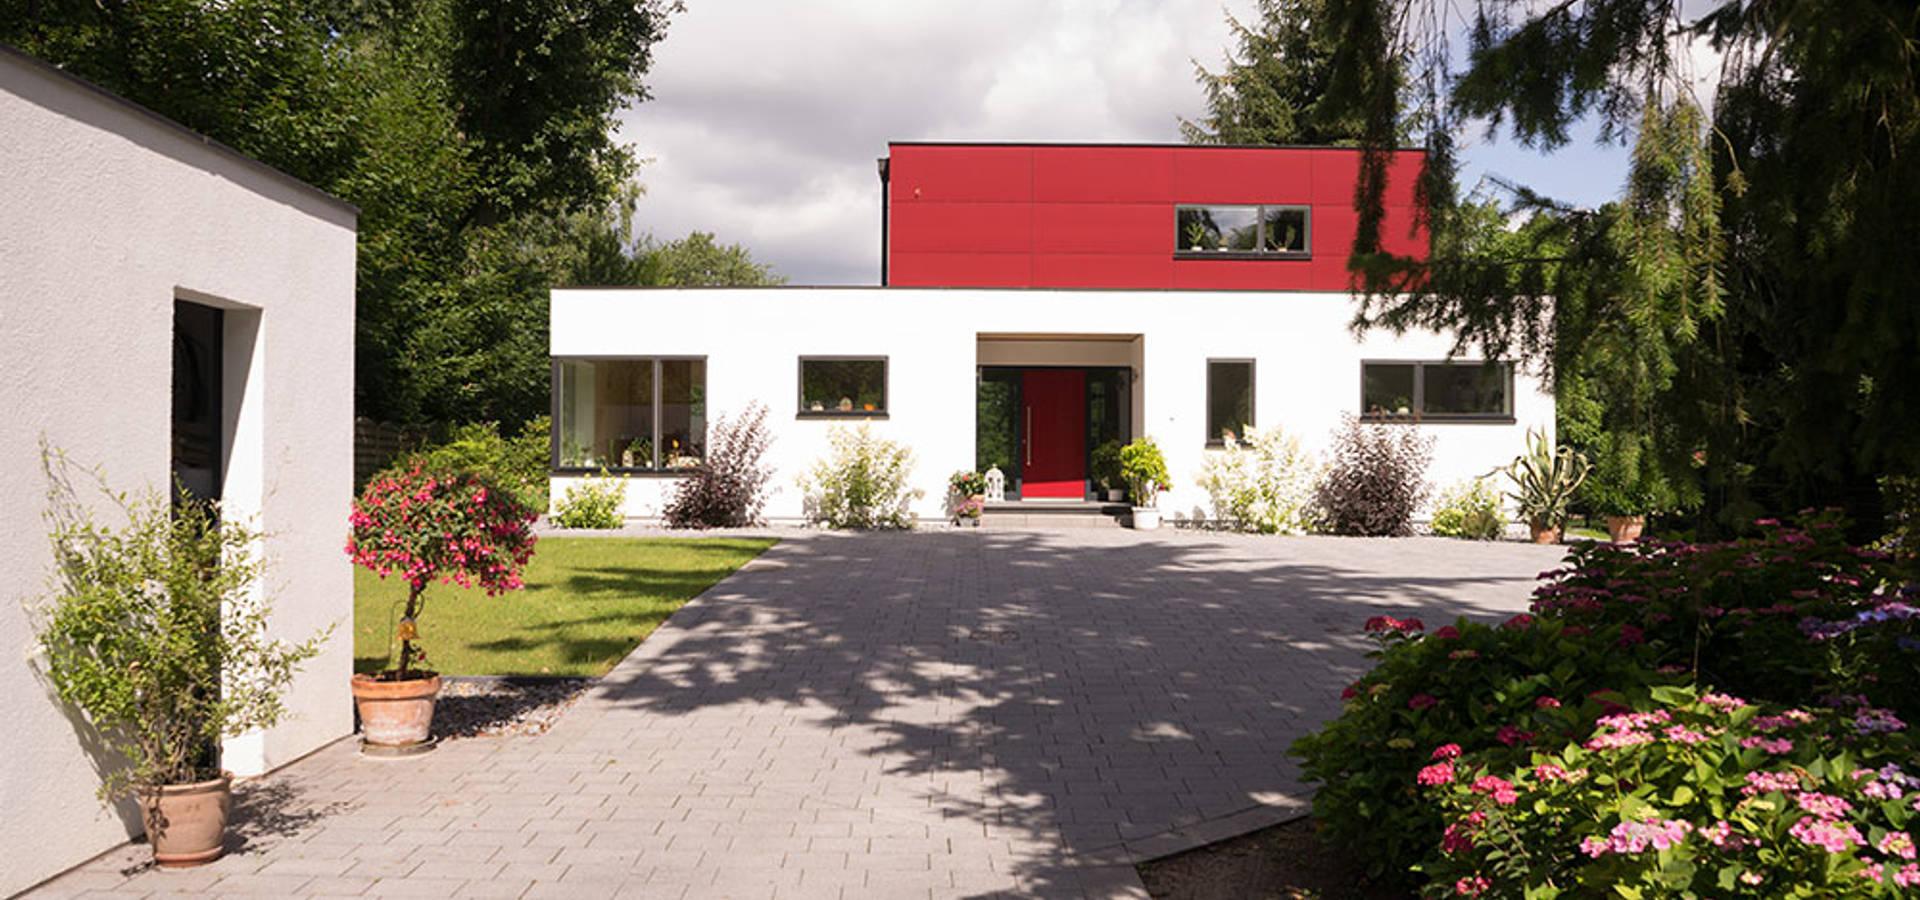 MAX-Haus GmbH